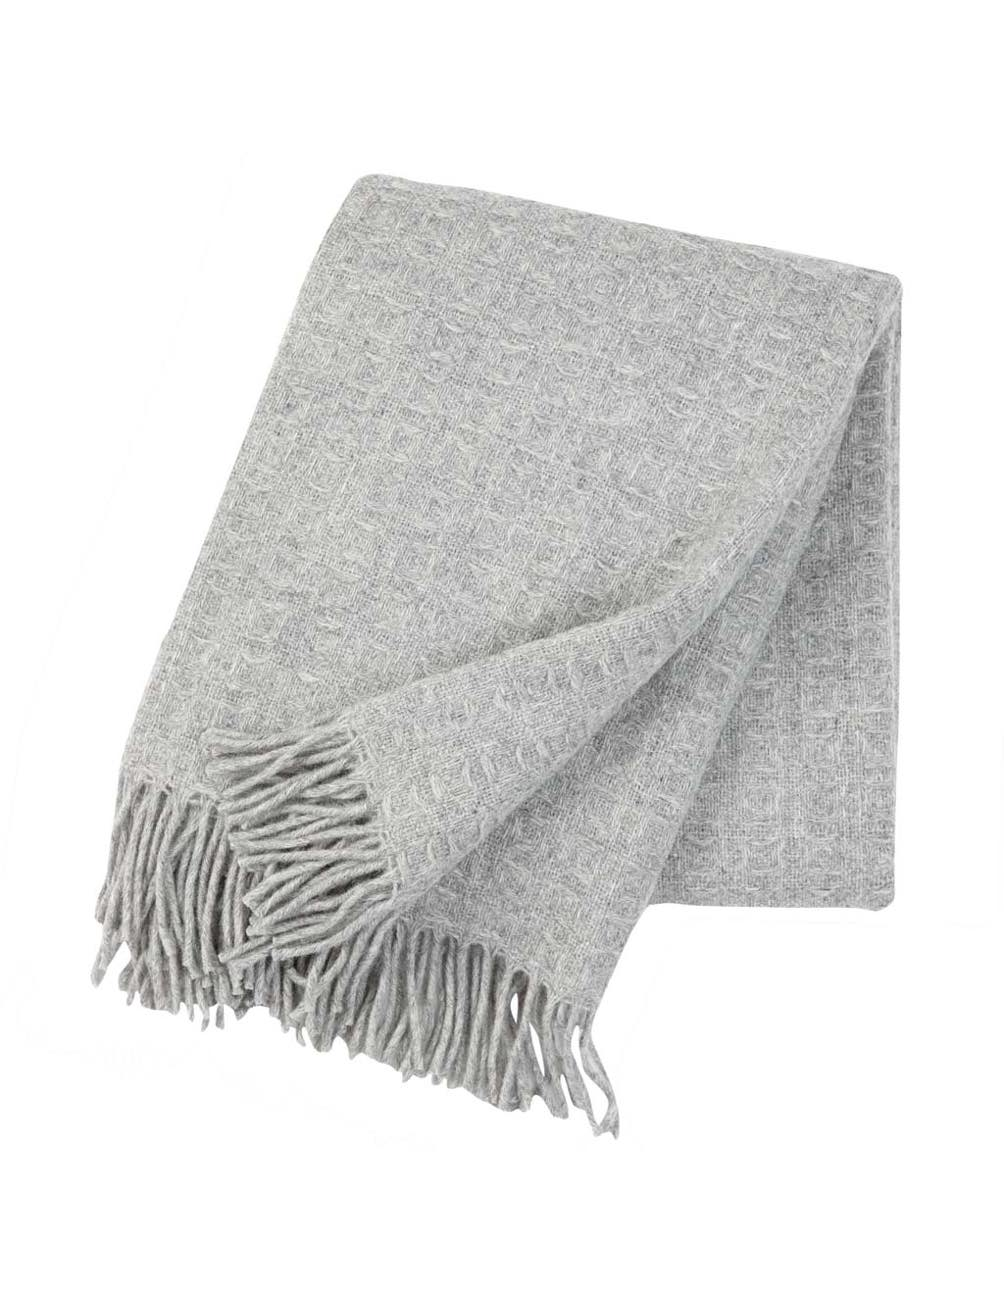 Twist Light Grey Blanket/Throw